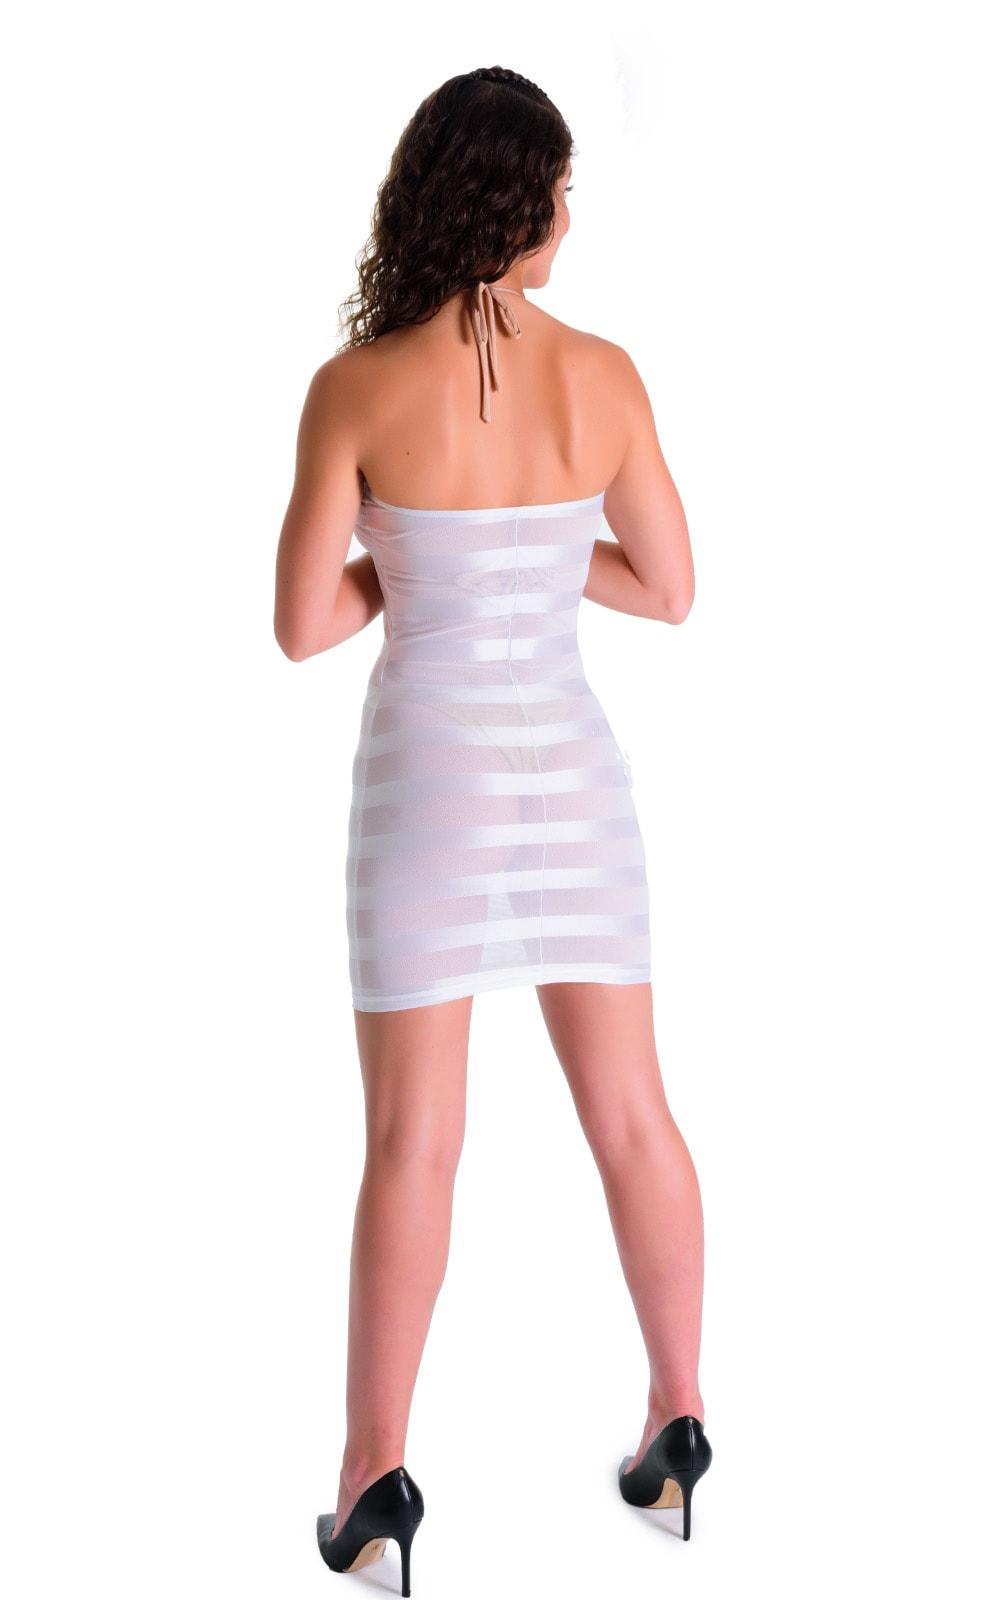 Mini Strapless Bodycon Dress in White Satin Stripe Mesh 2